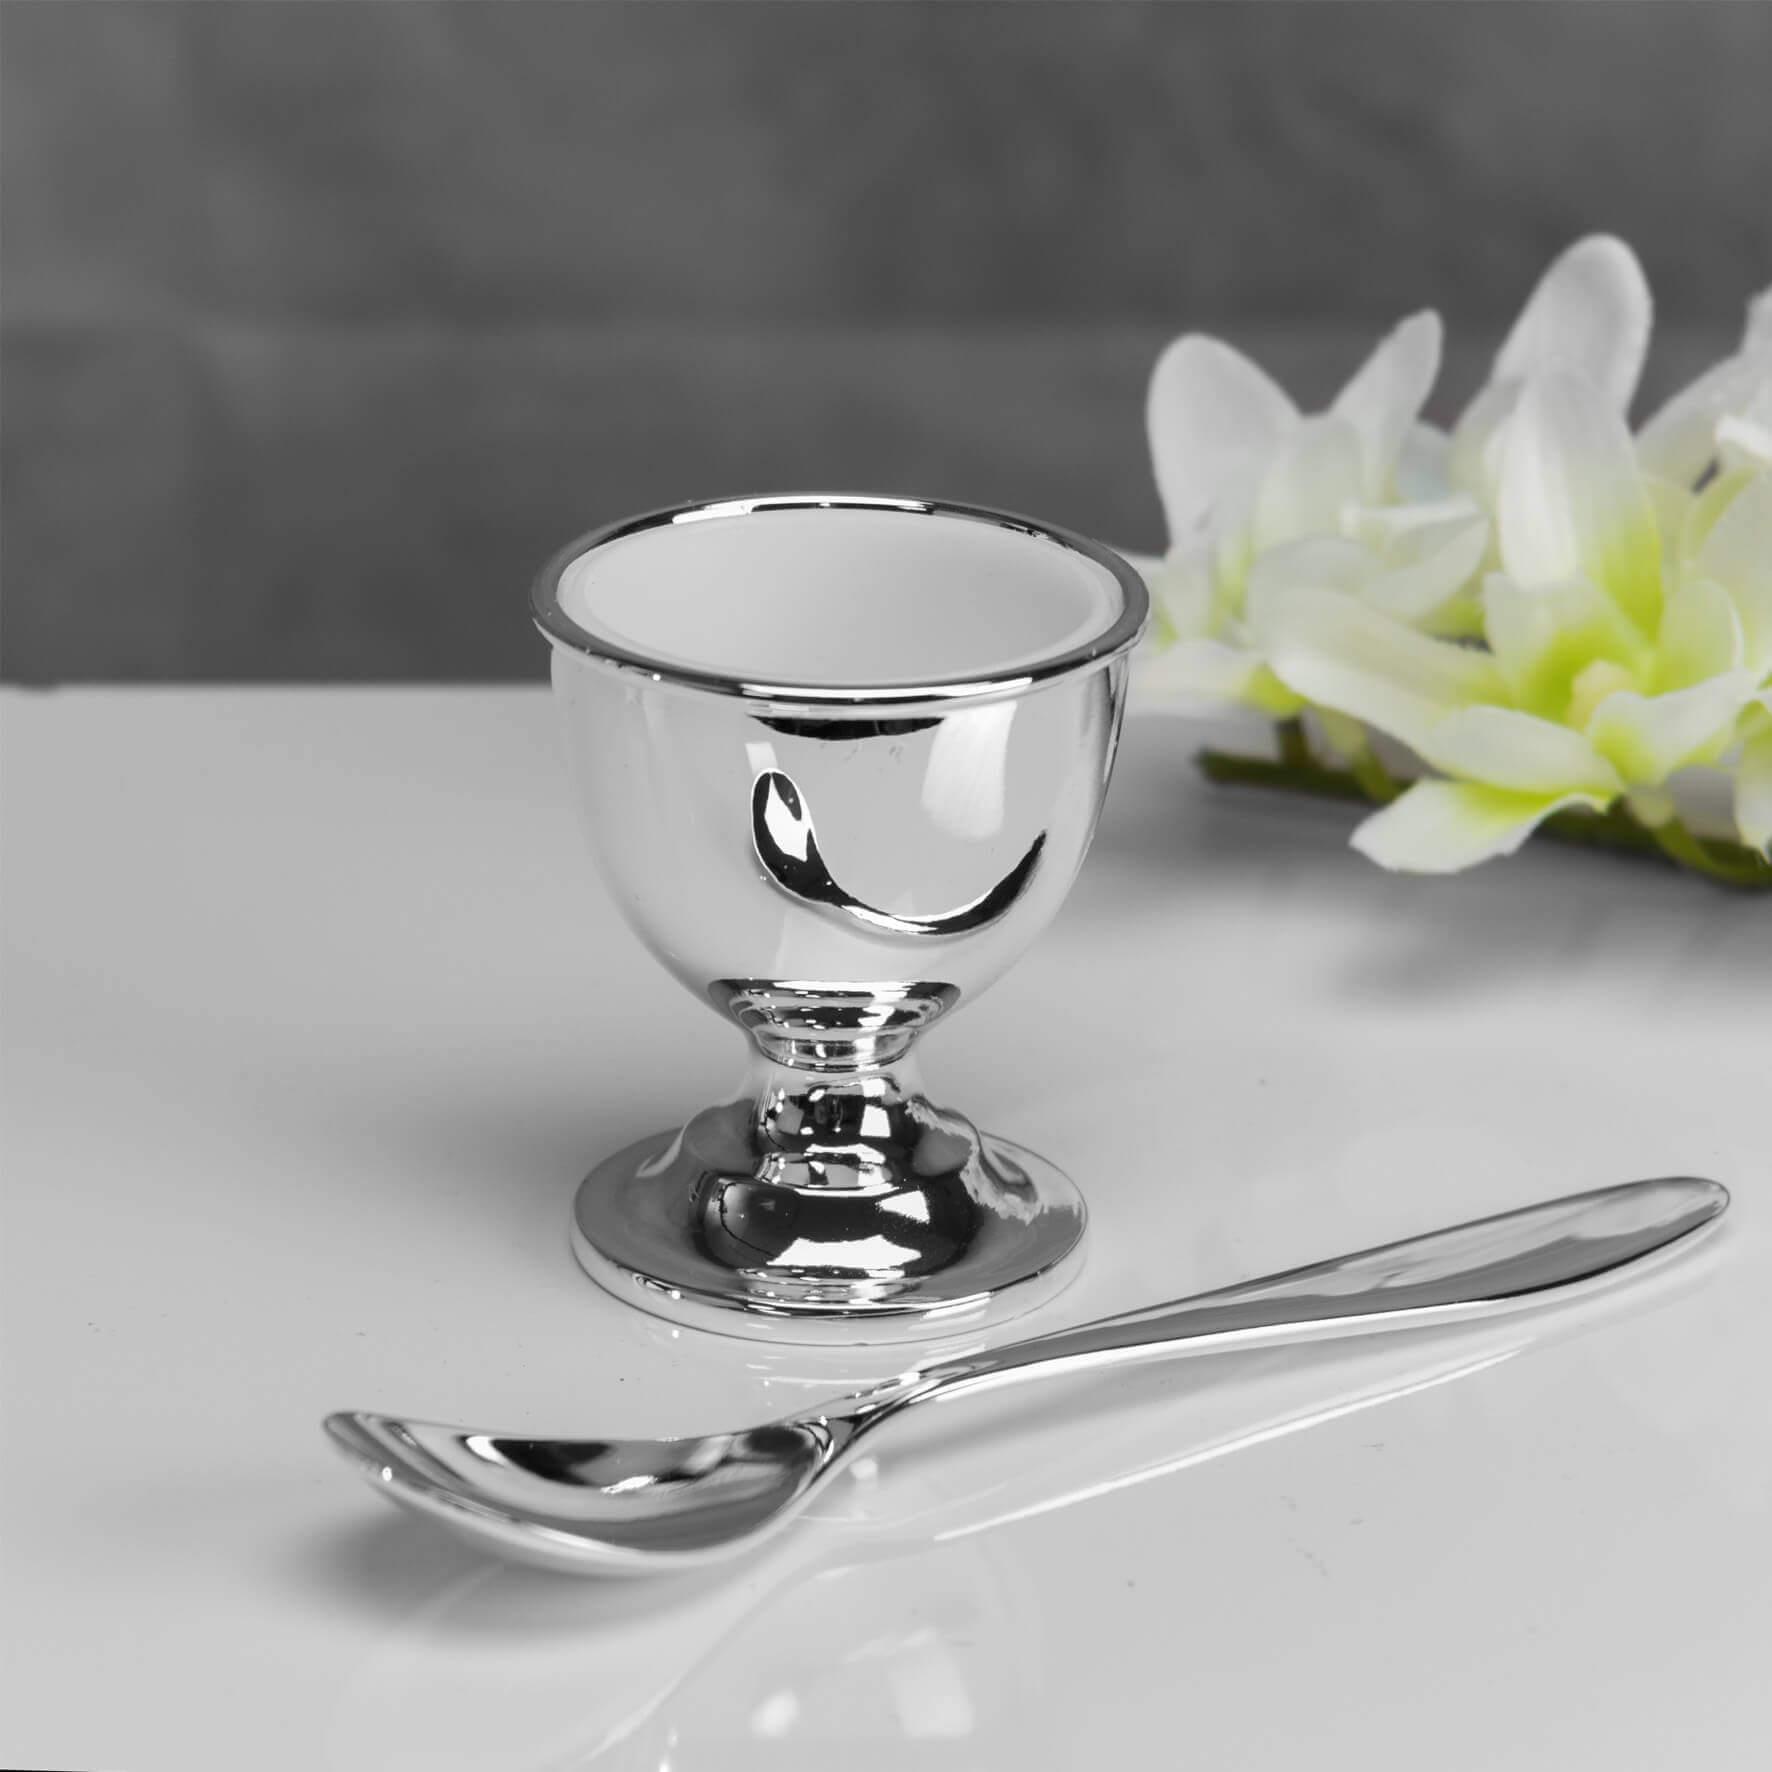 Bambino by Juliana - Set argintat mic dejun